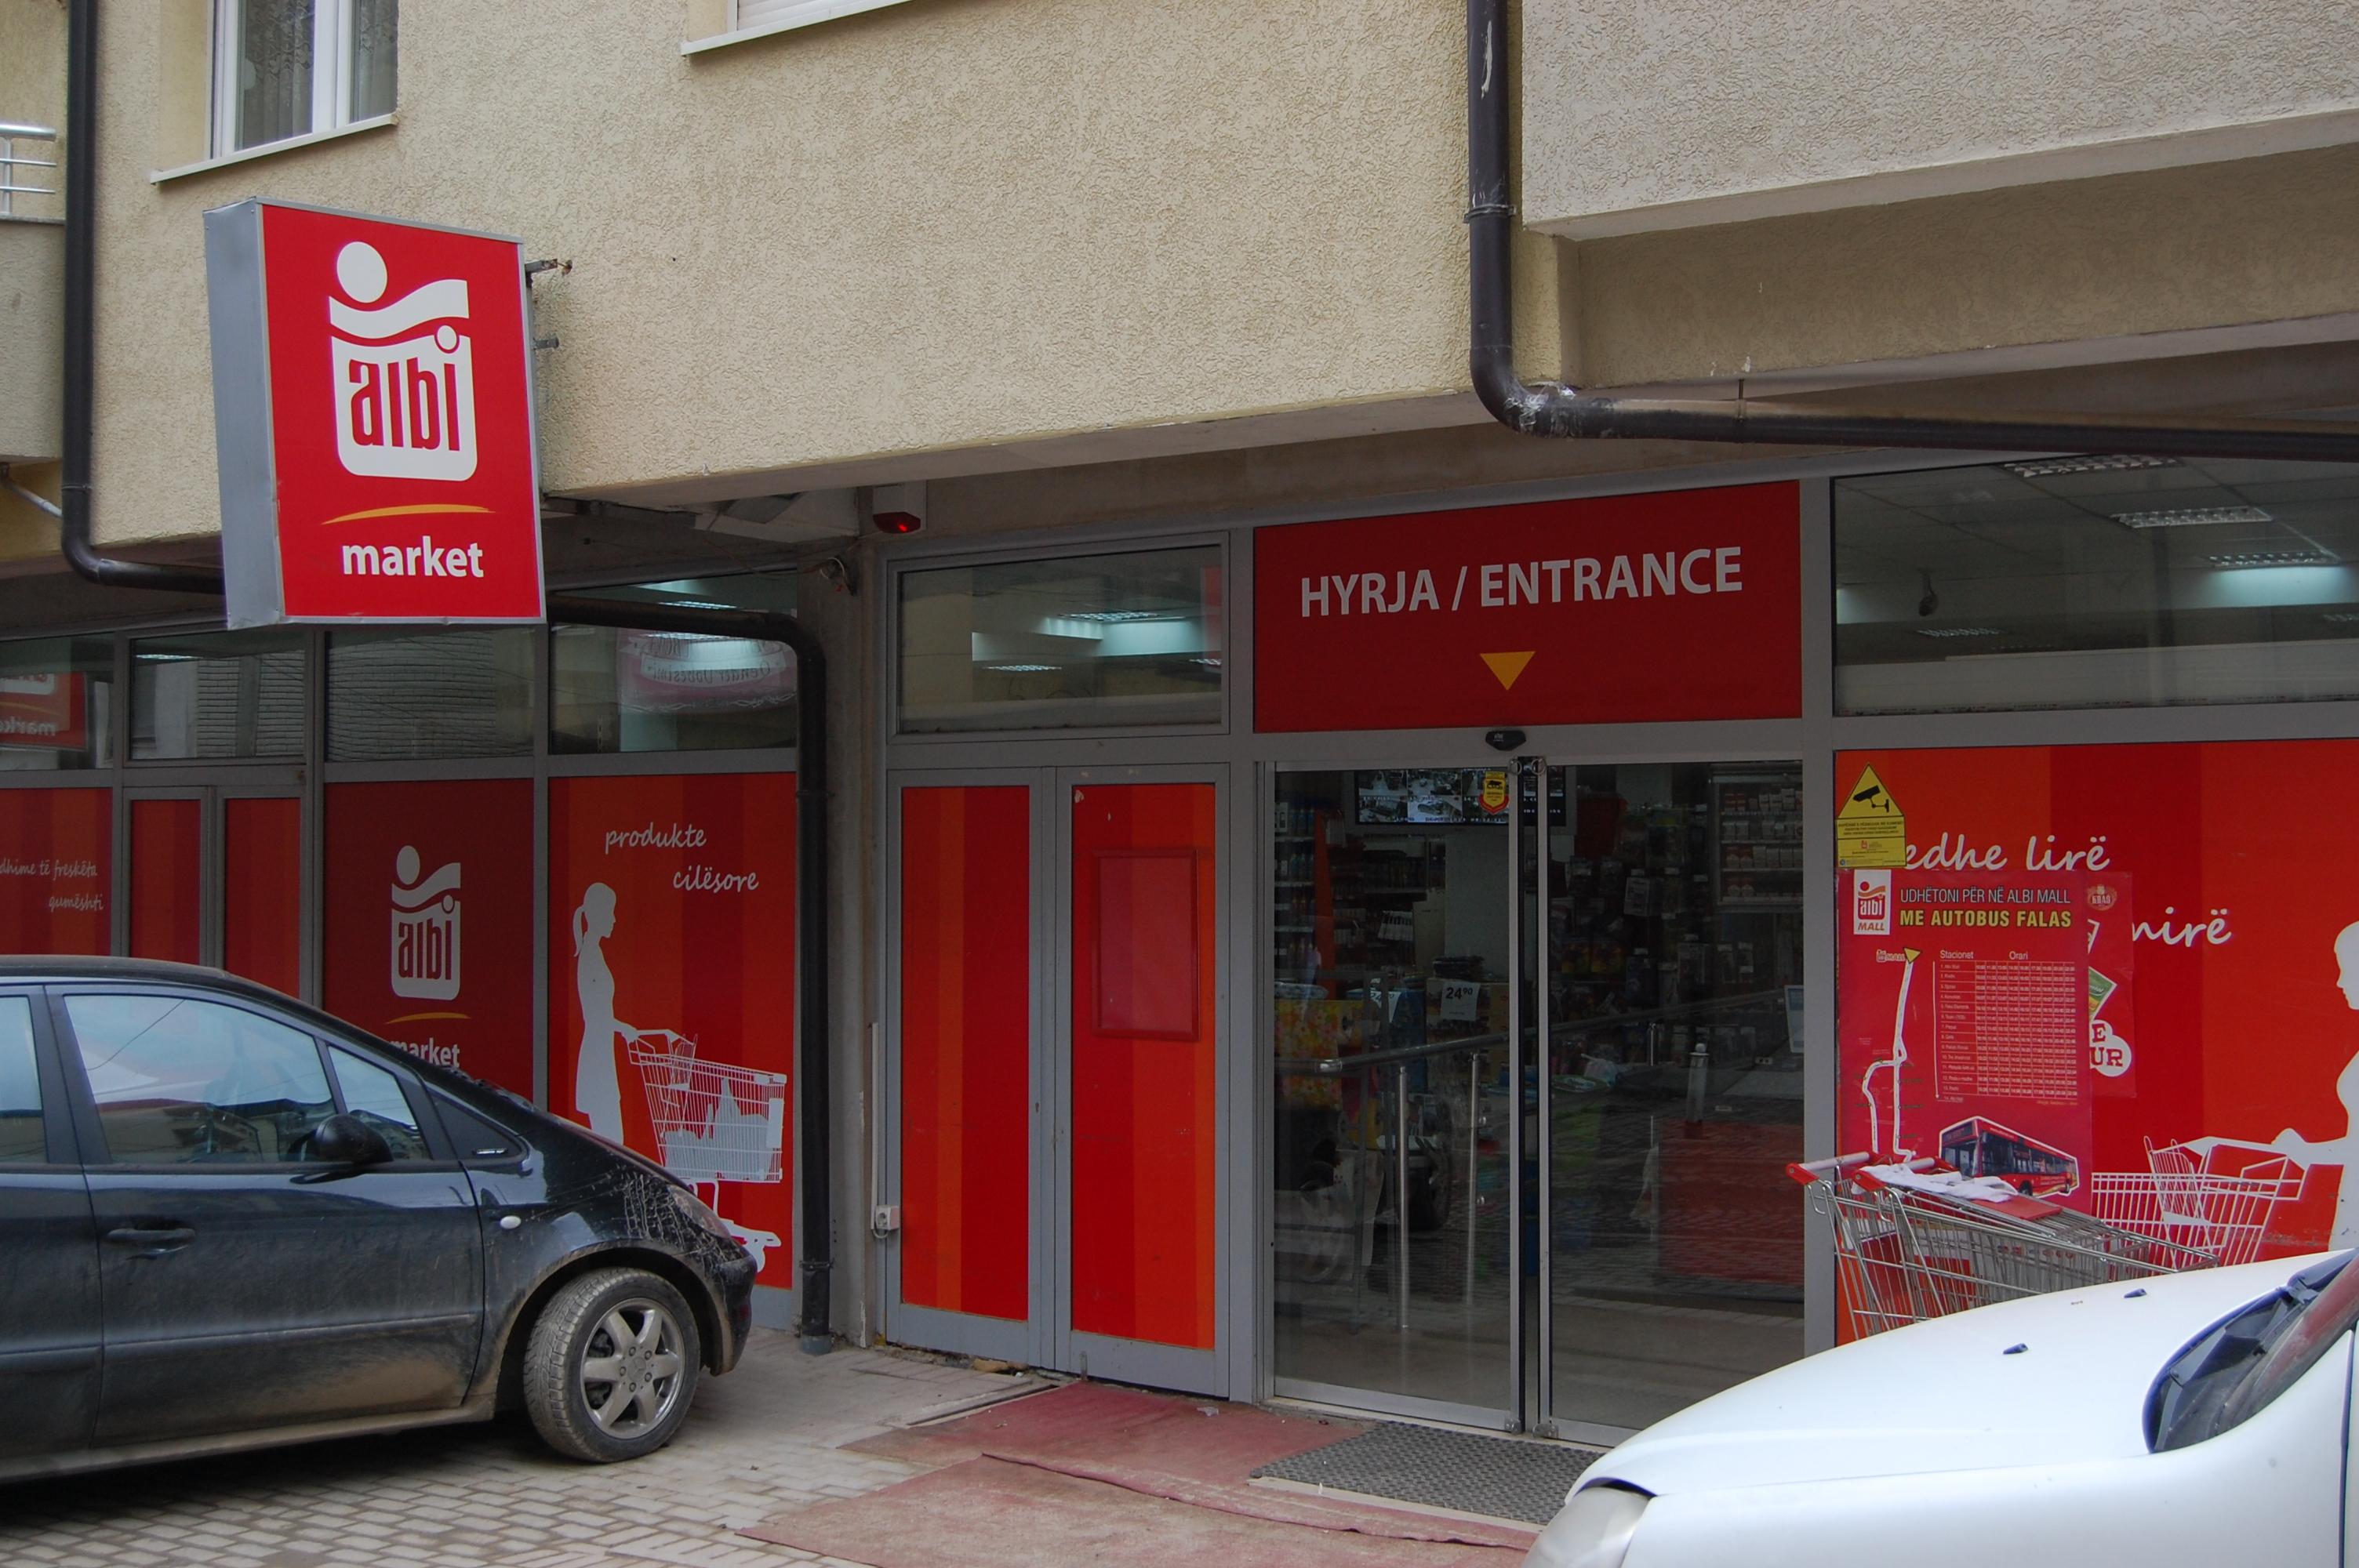 Алби магазин 65000 евро